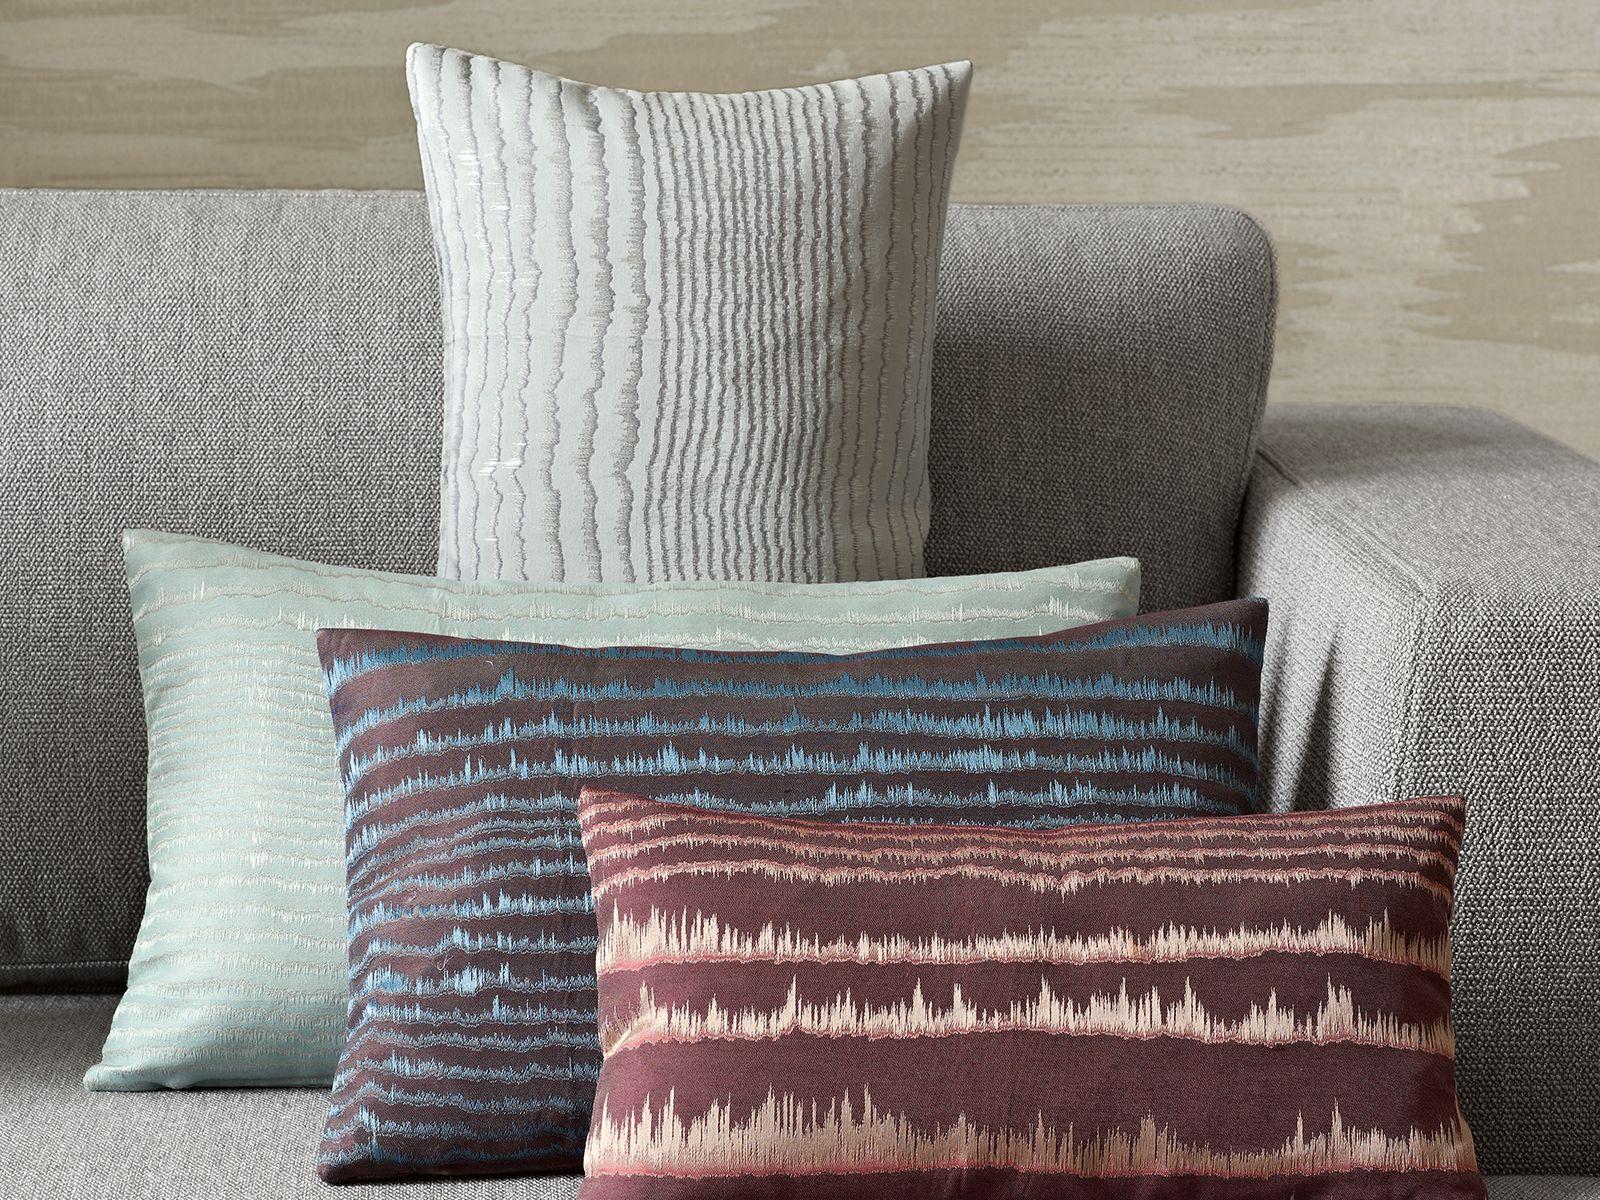 Zimmer + Rohde, living room, Wohnzimmer, cushions, Kissen, Sofa ...